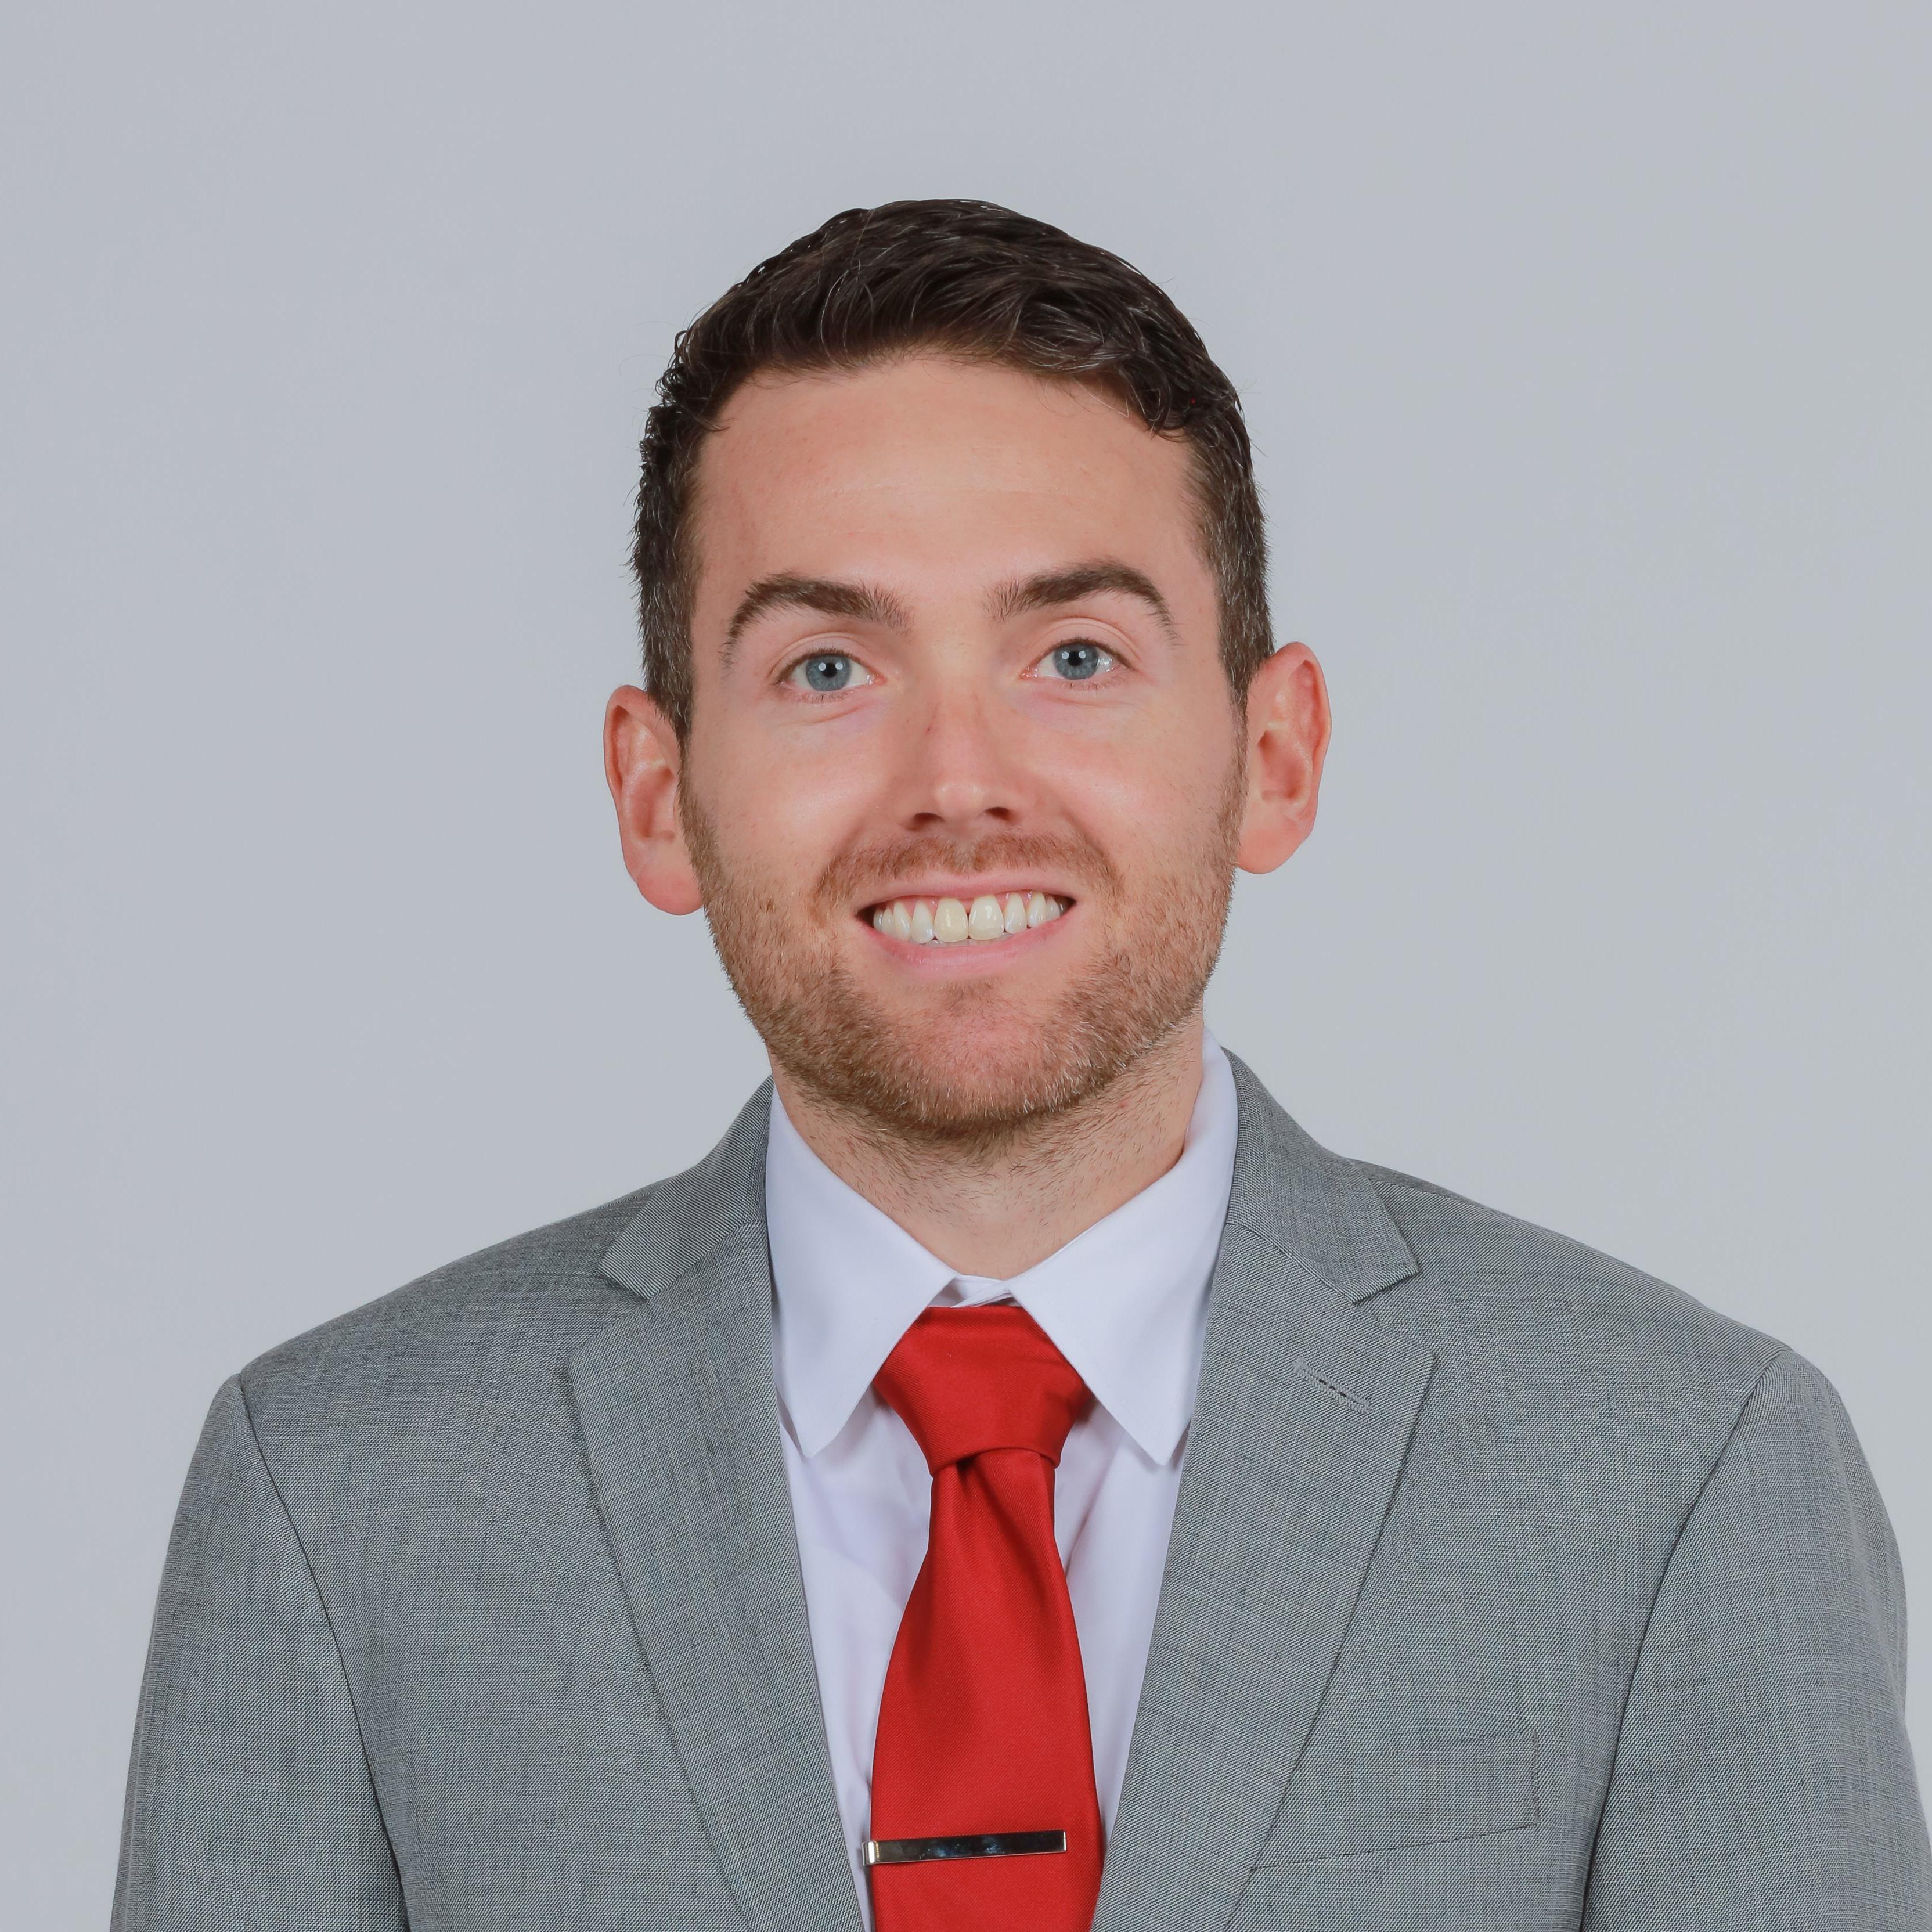 Devan Blair from Houston Rockets